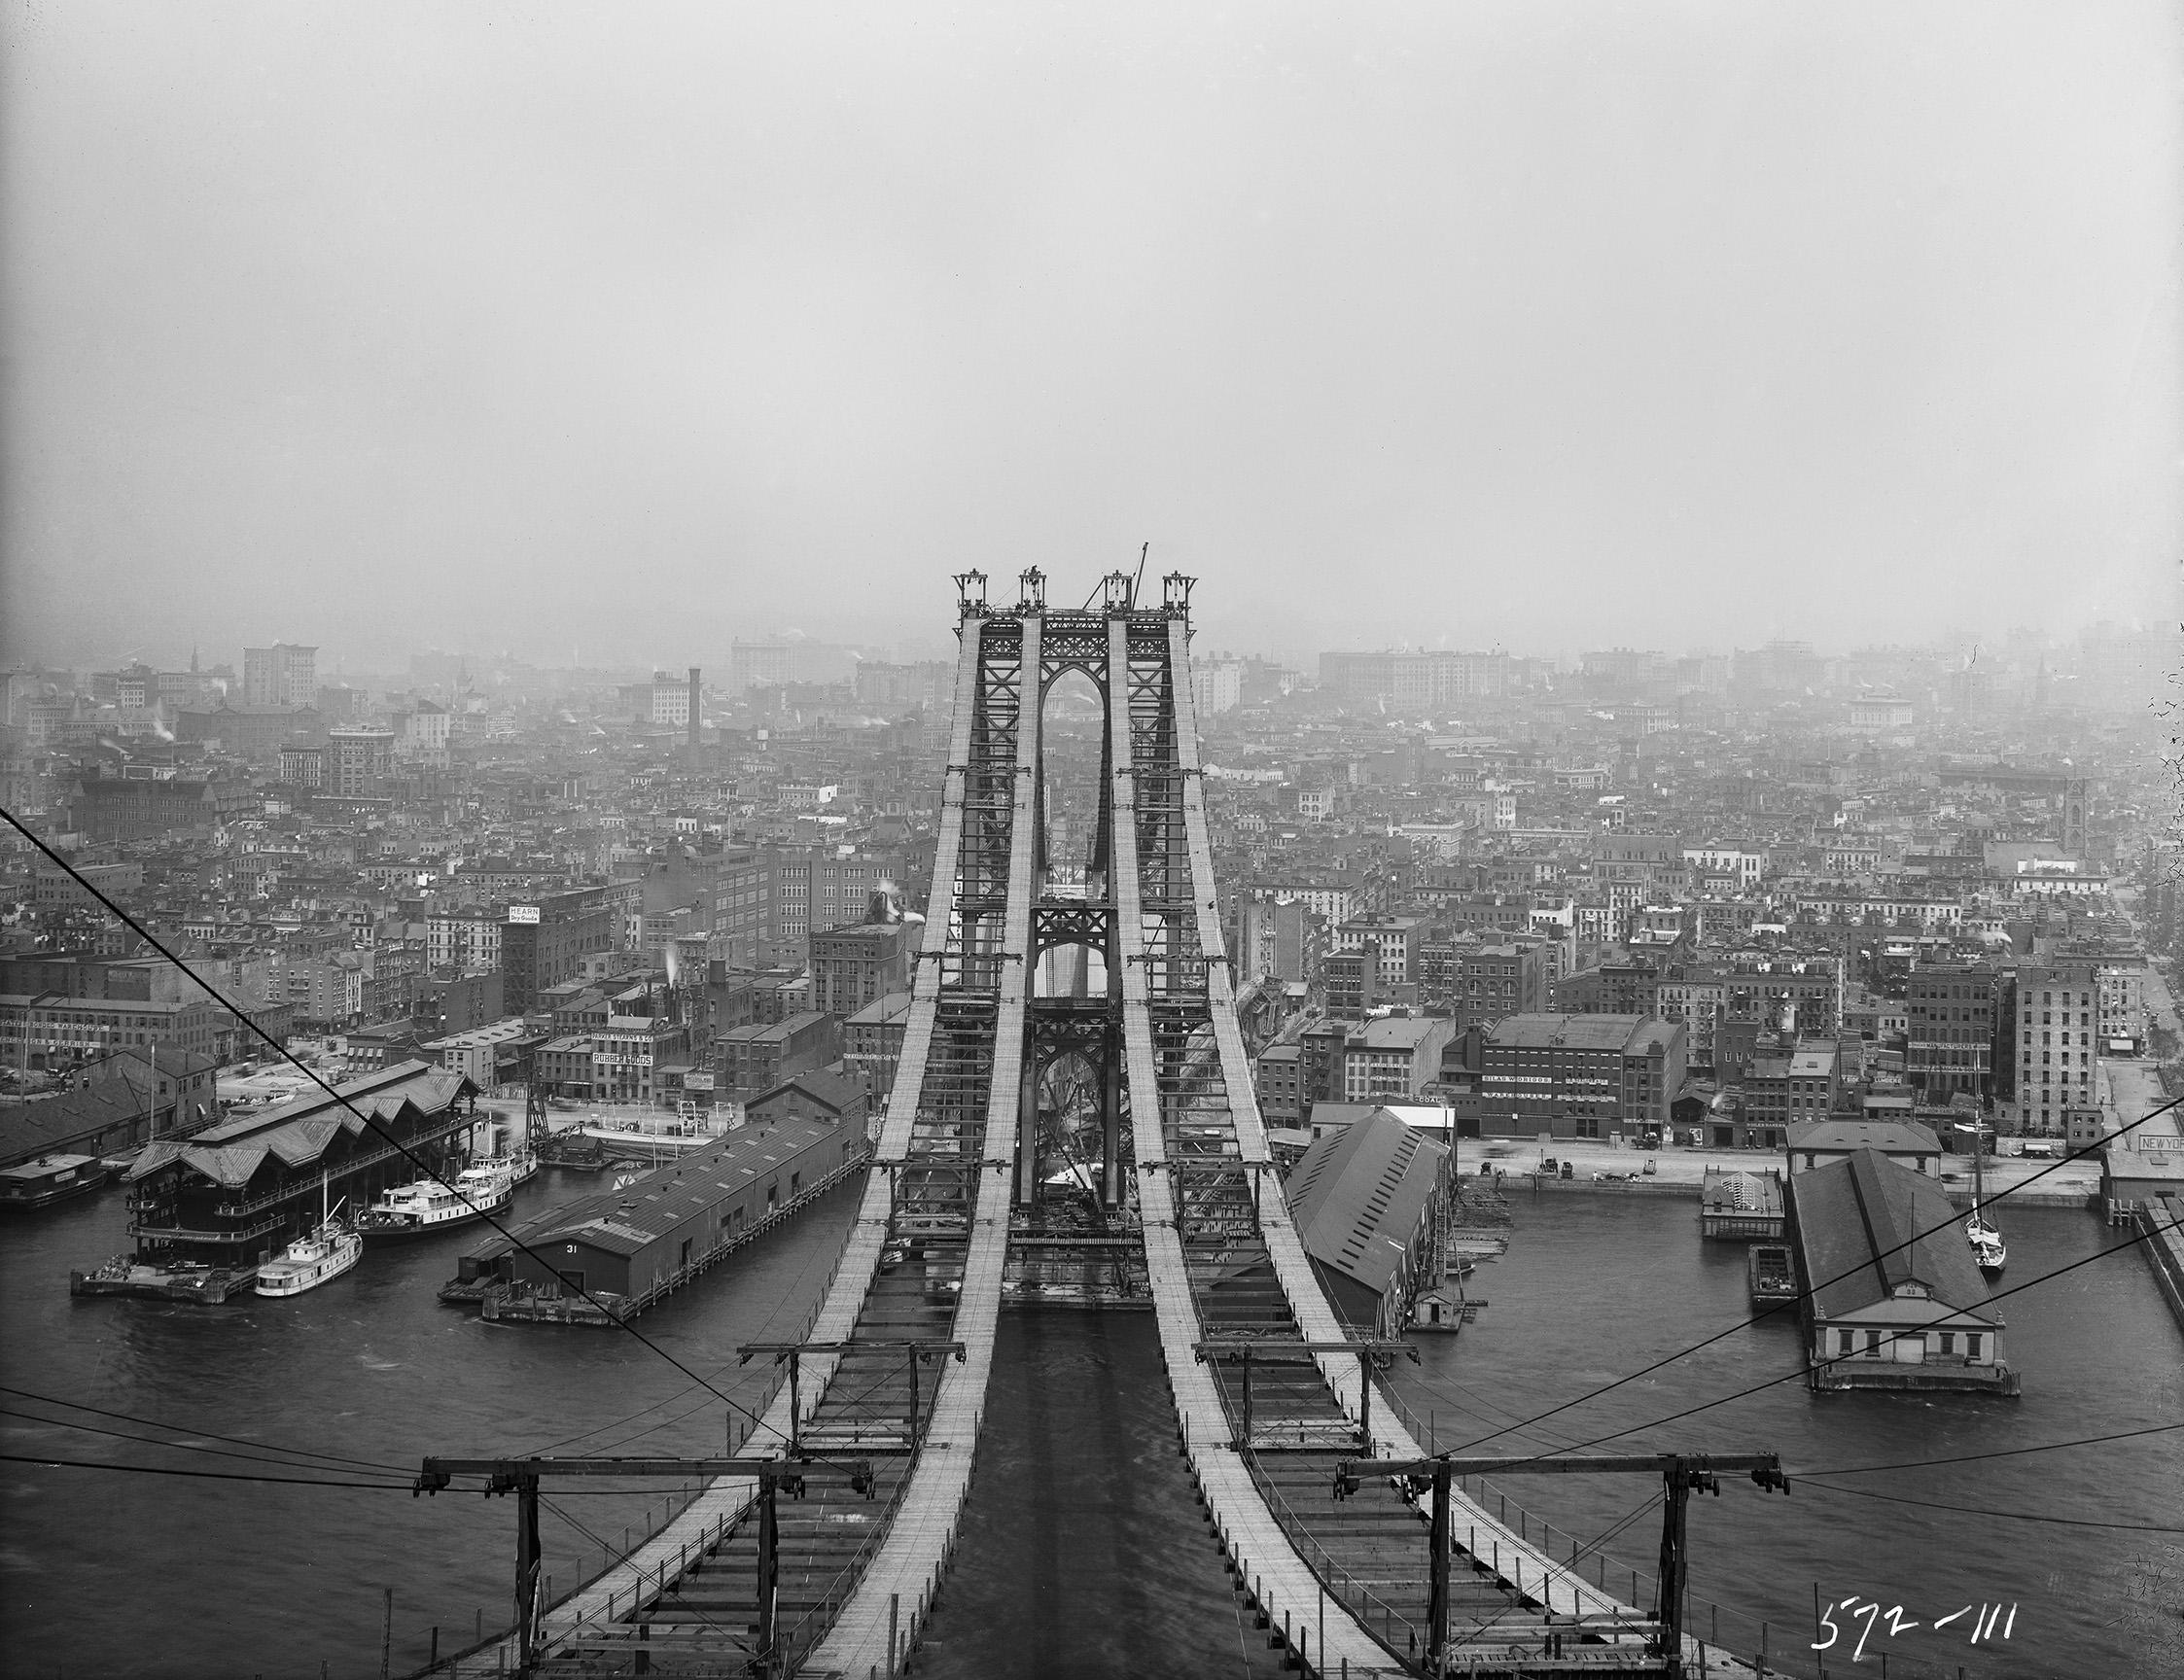 Manhattan Bridge, looking west from Brooklyn tower showing foot walk, Eugene de Salignac, August 2, 1908